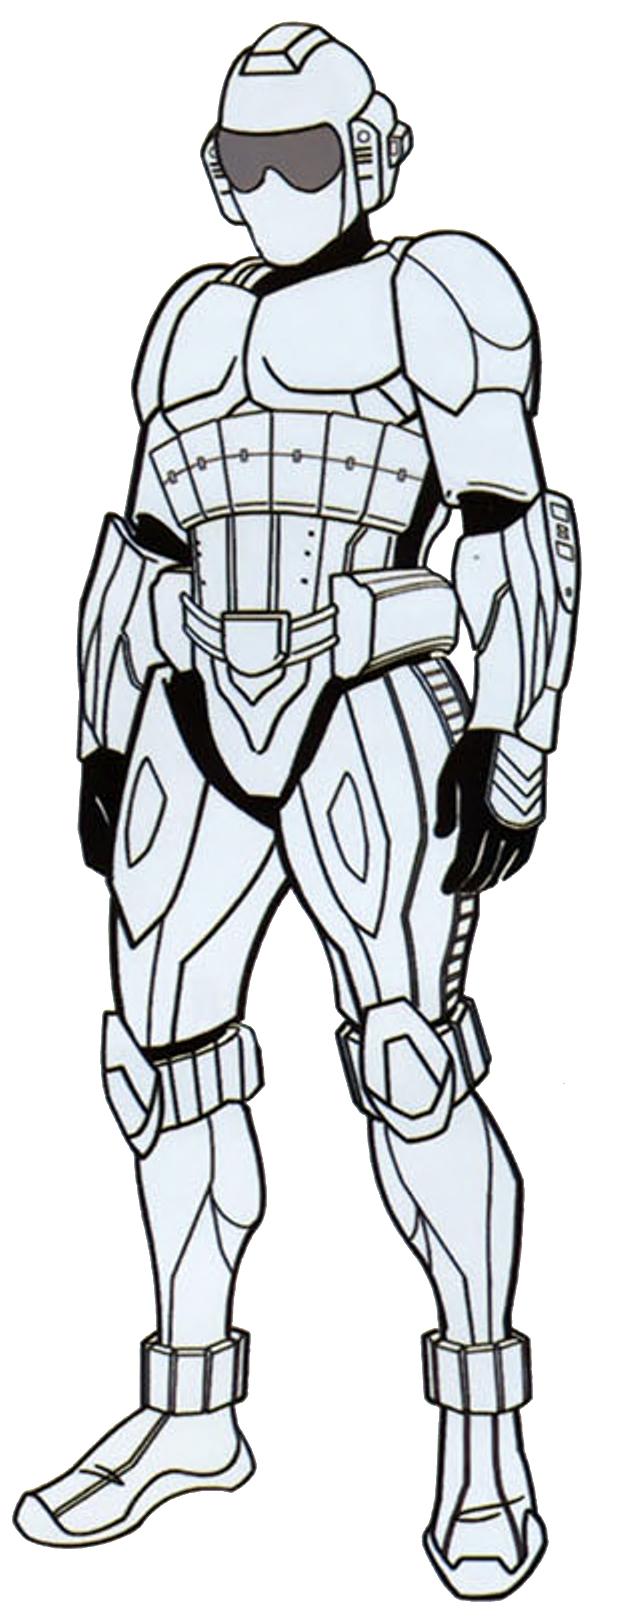 Protector 1 combat armor